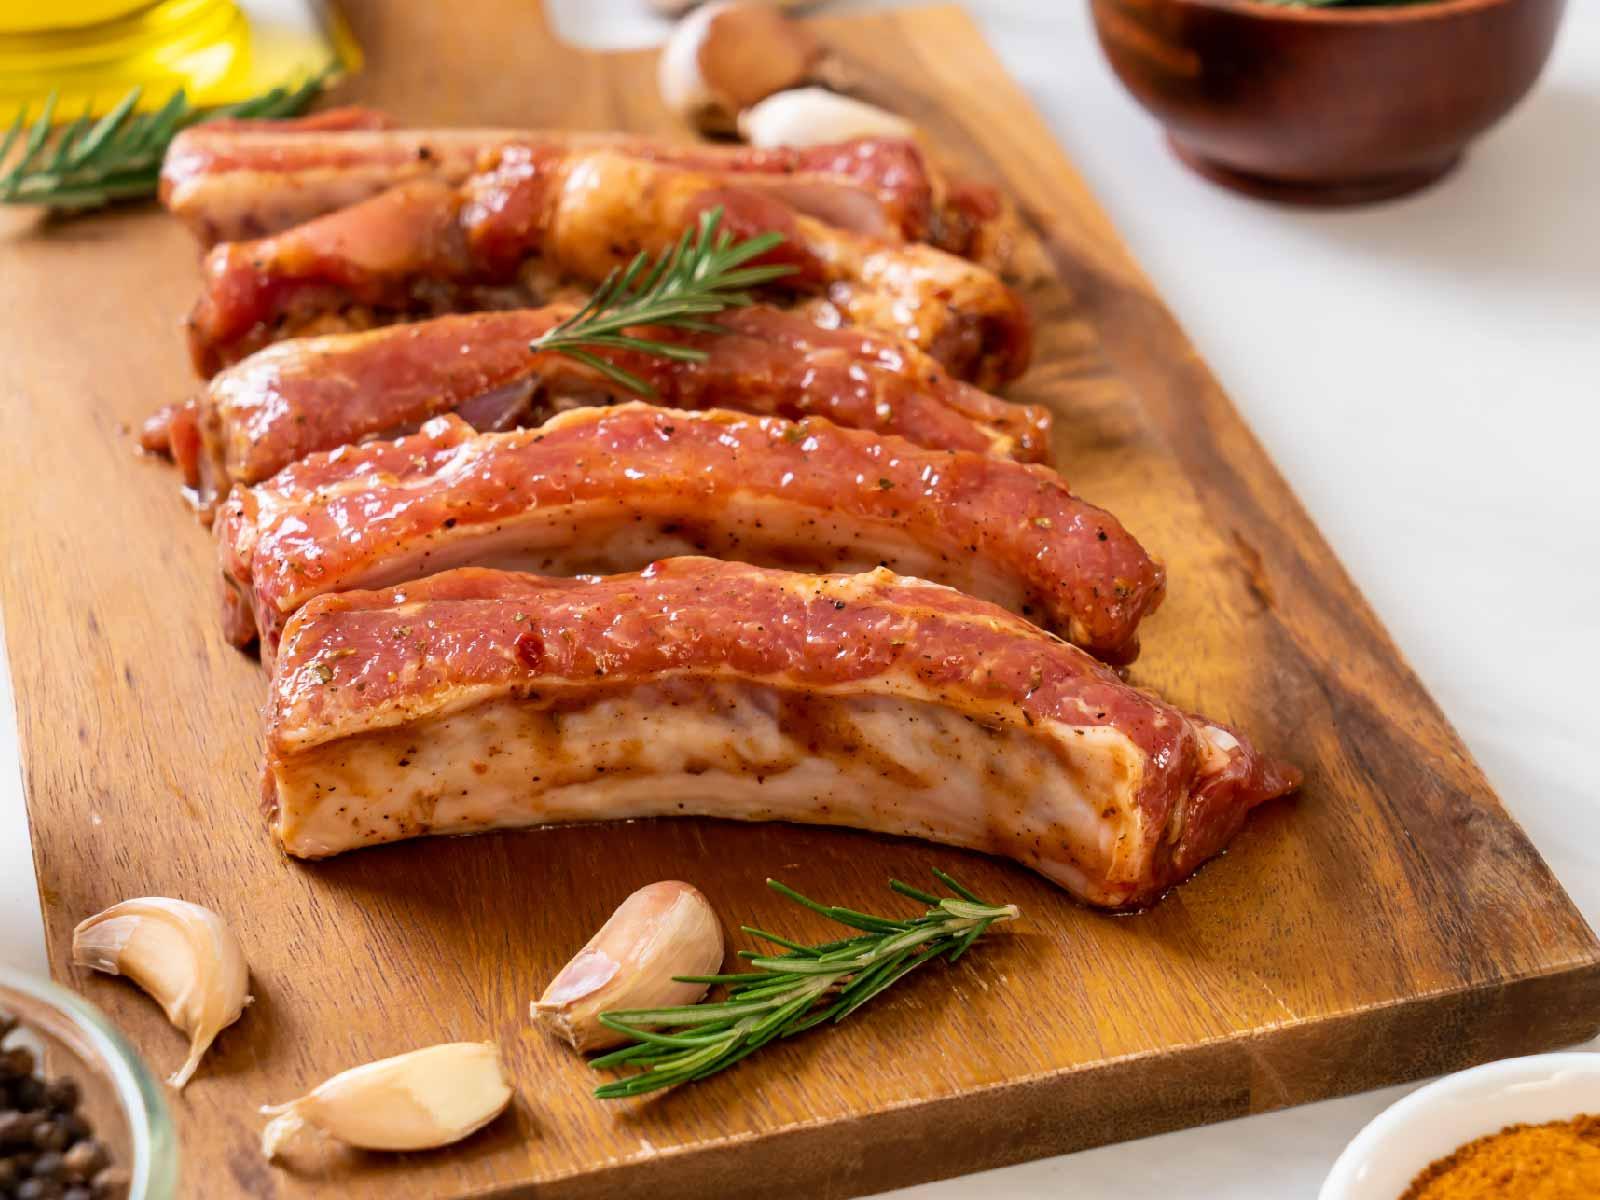 Sácale máximo provecho a la carne de cerdo